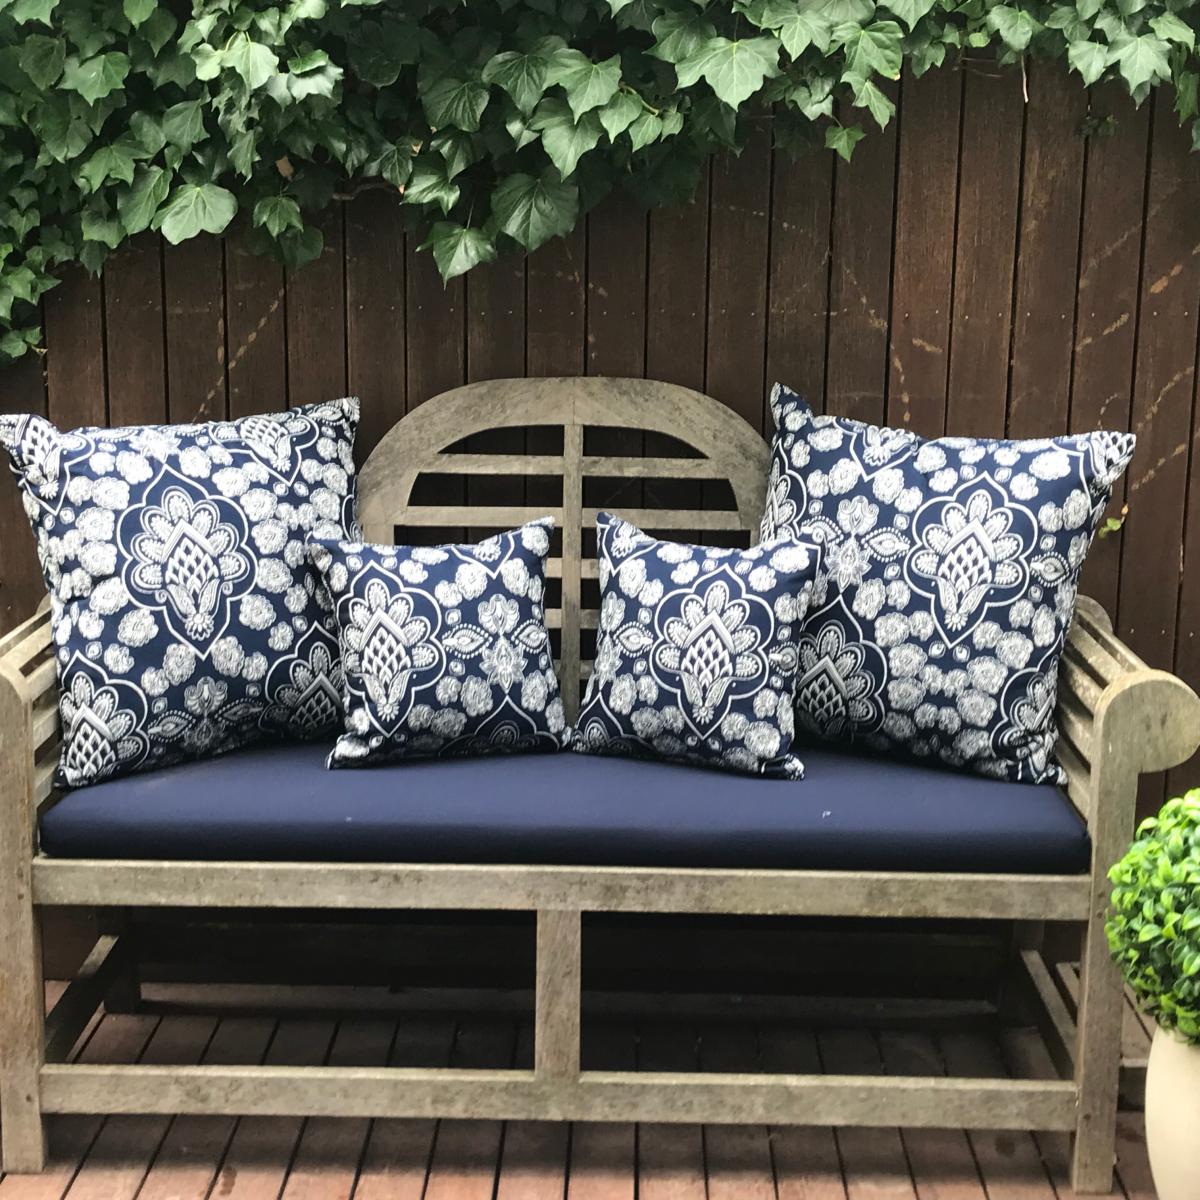 Outdoor Chair Cushions Sydney Brisbane Melbourne Perth